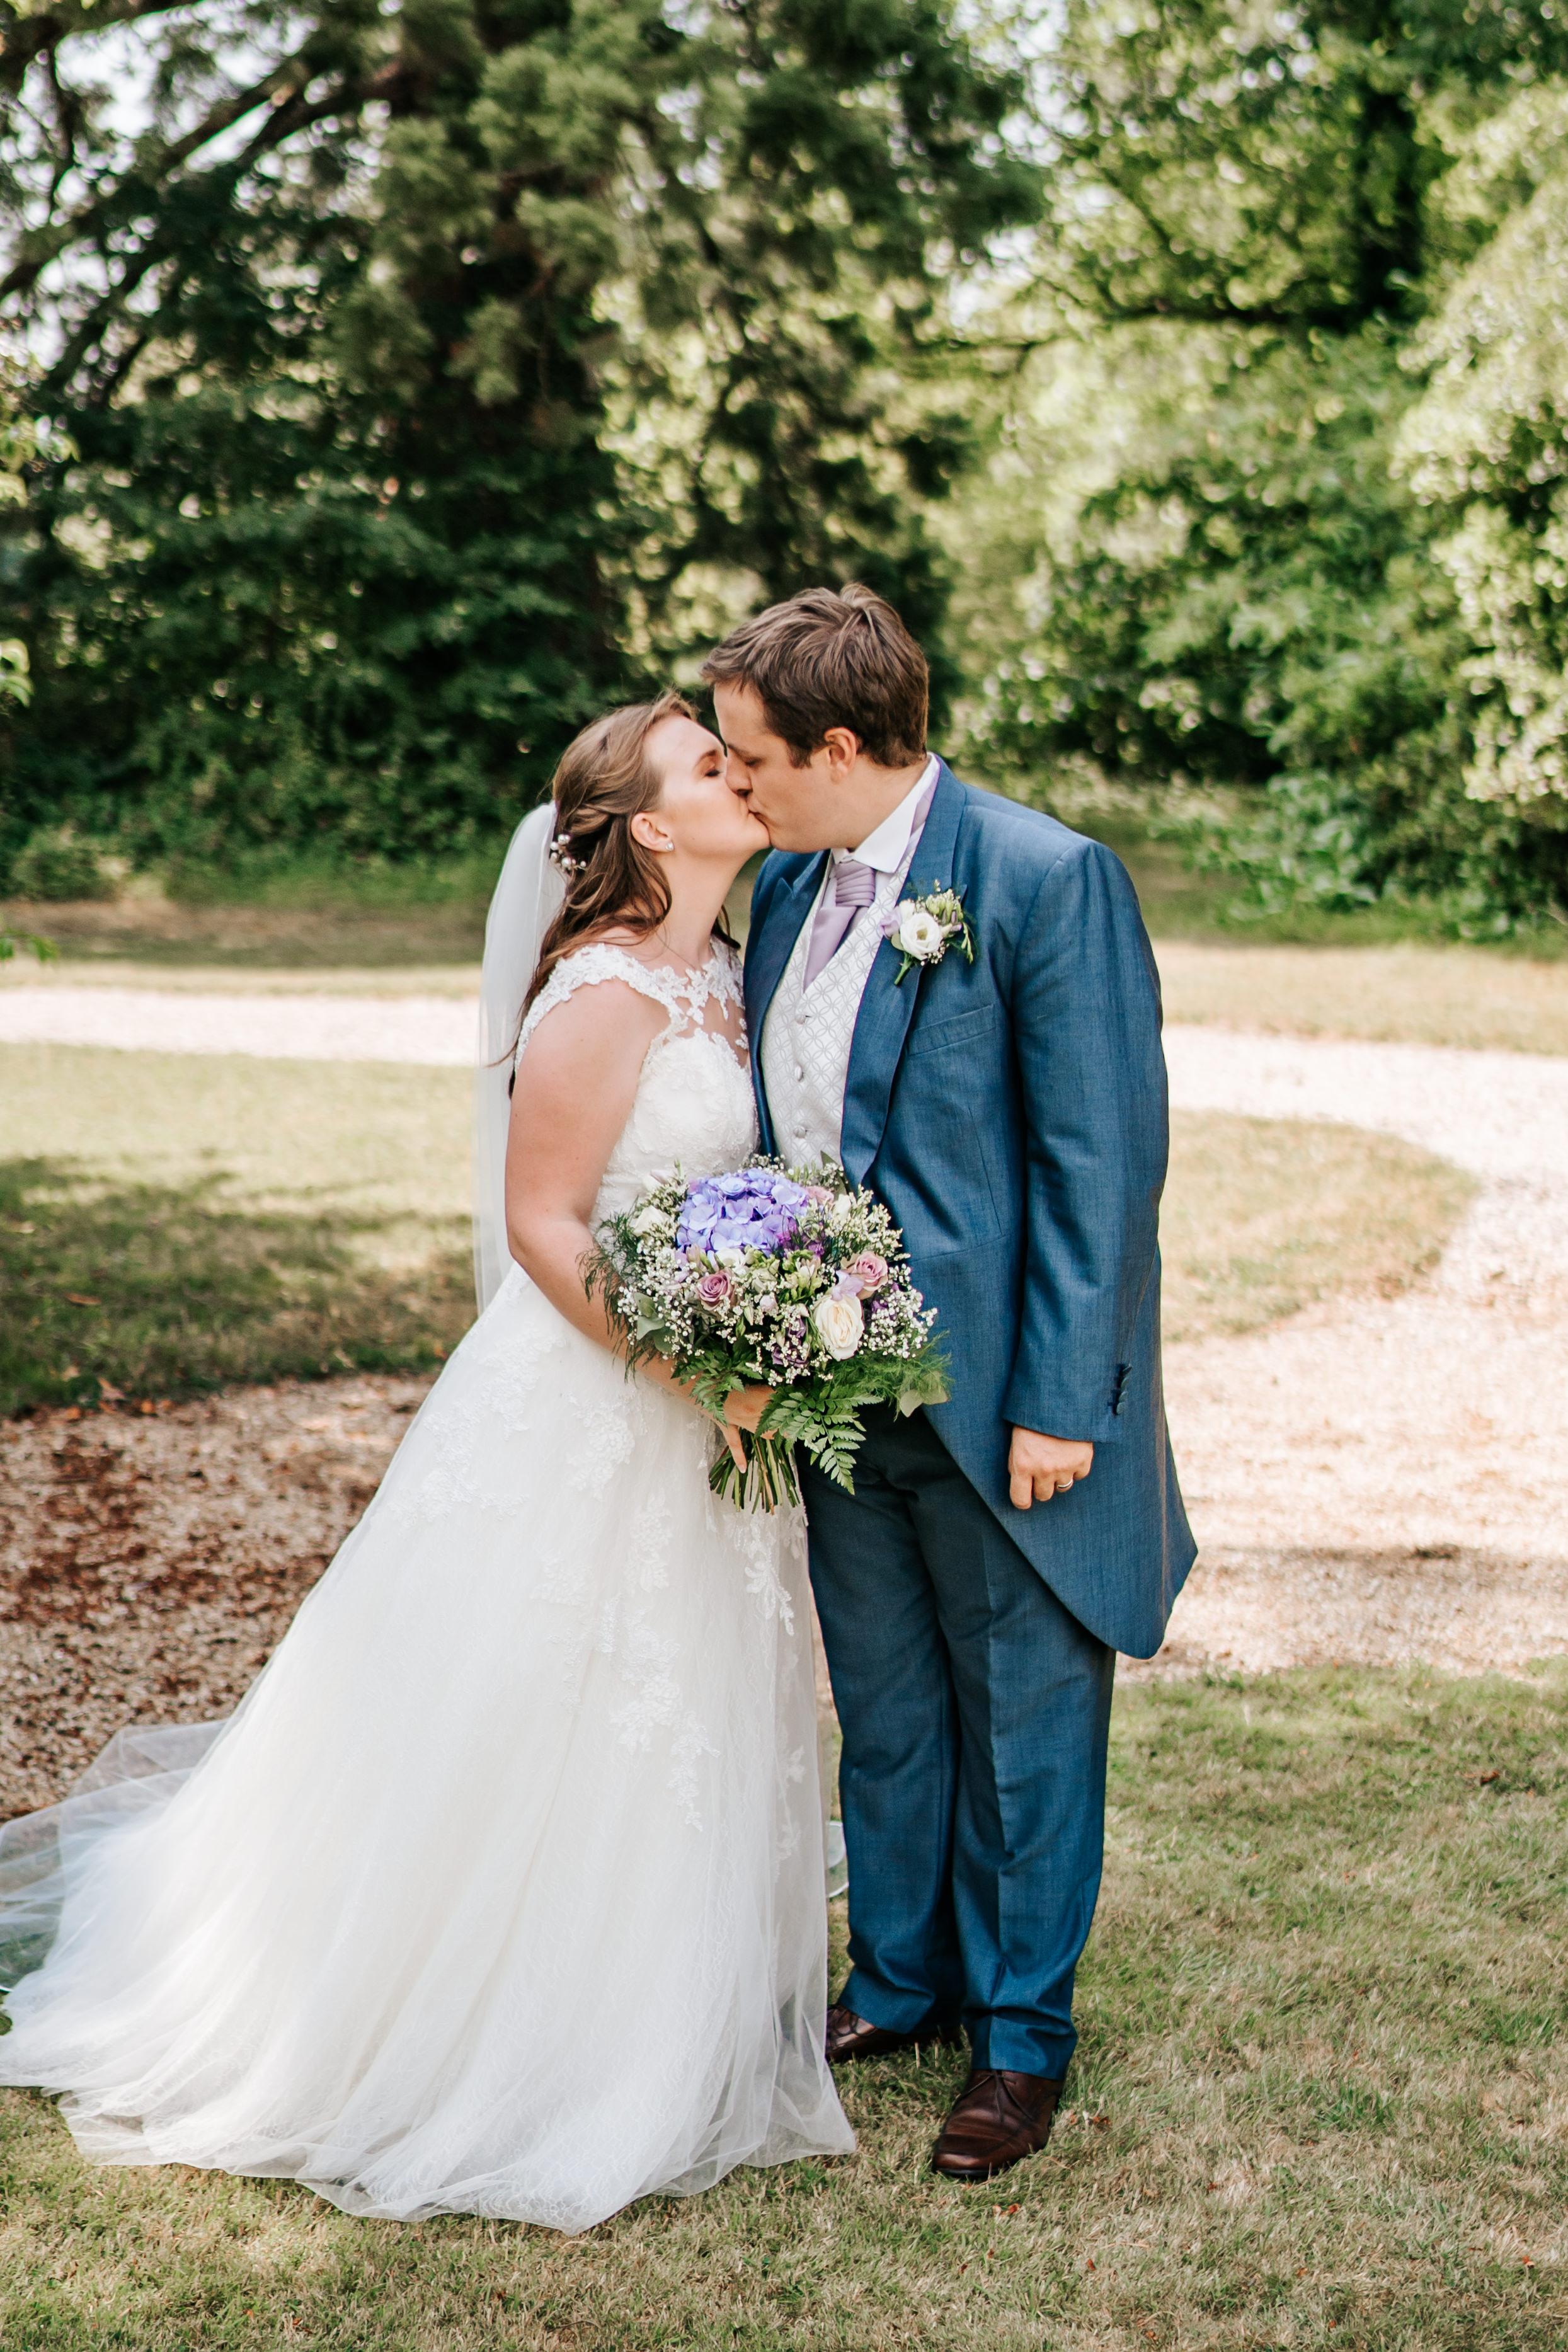 Kayleigh & Dan 2019-306.jpg